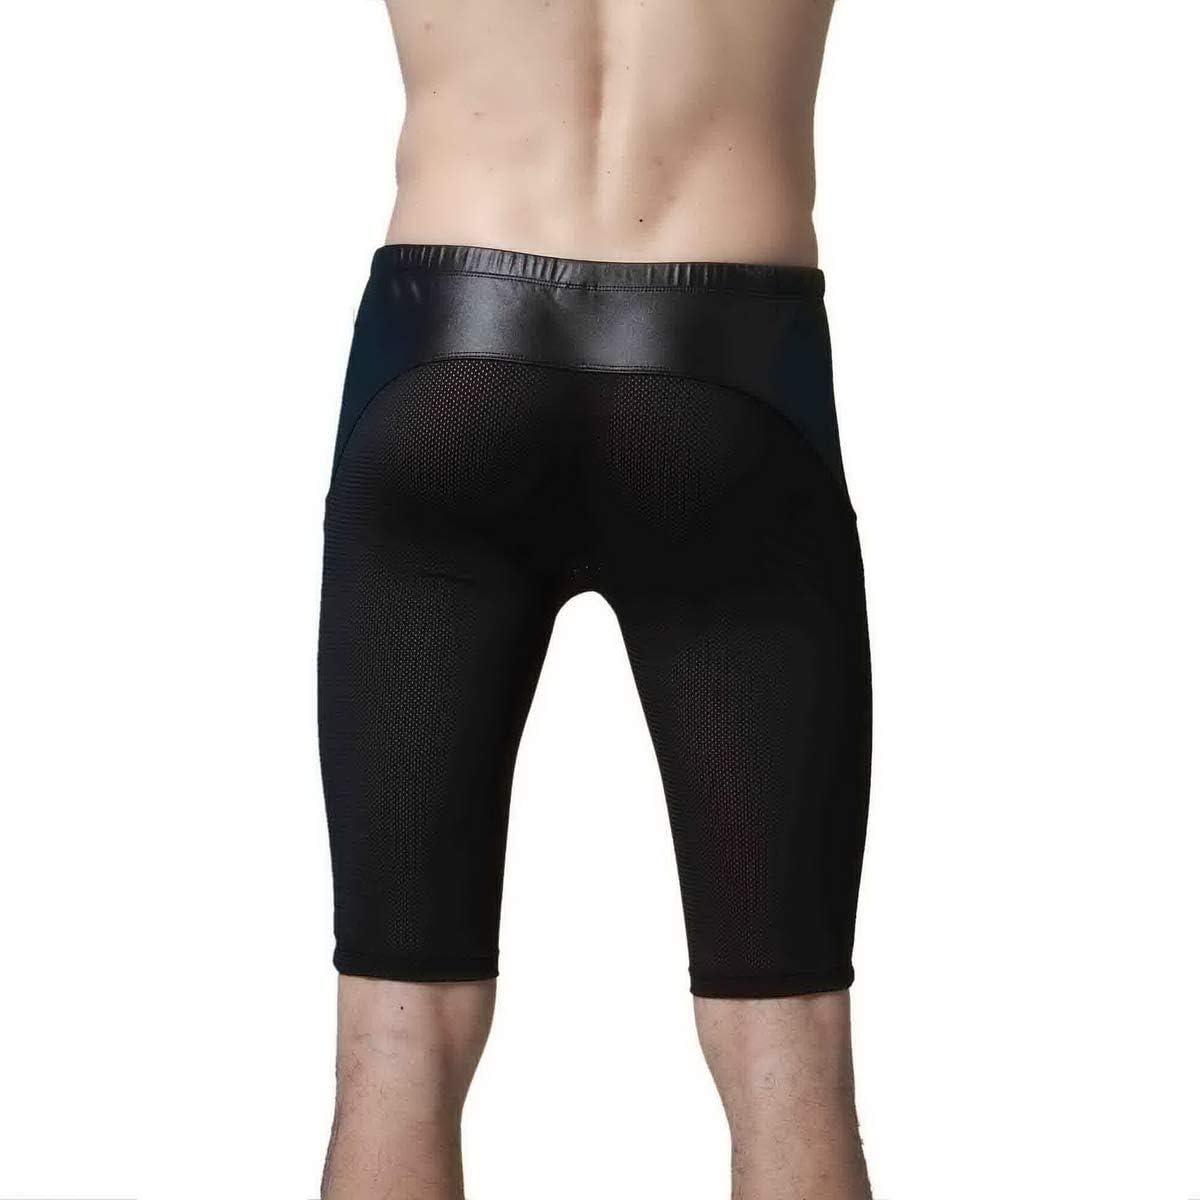 Mongous Mens Tight Yoga Drawstring Mesh Training Bodybuilding Gym Workout Shorts Pnats